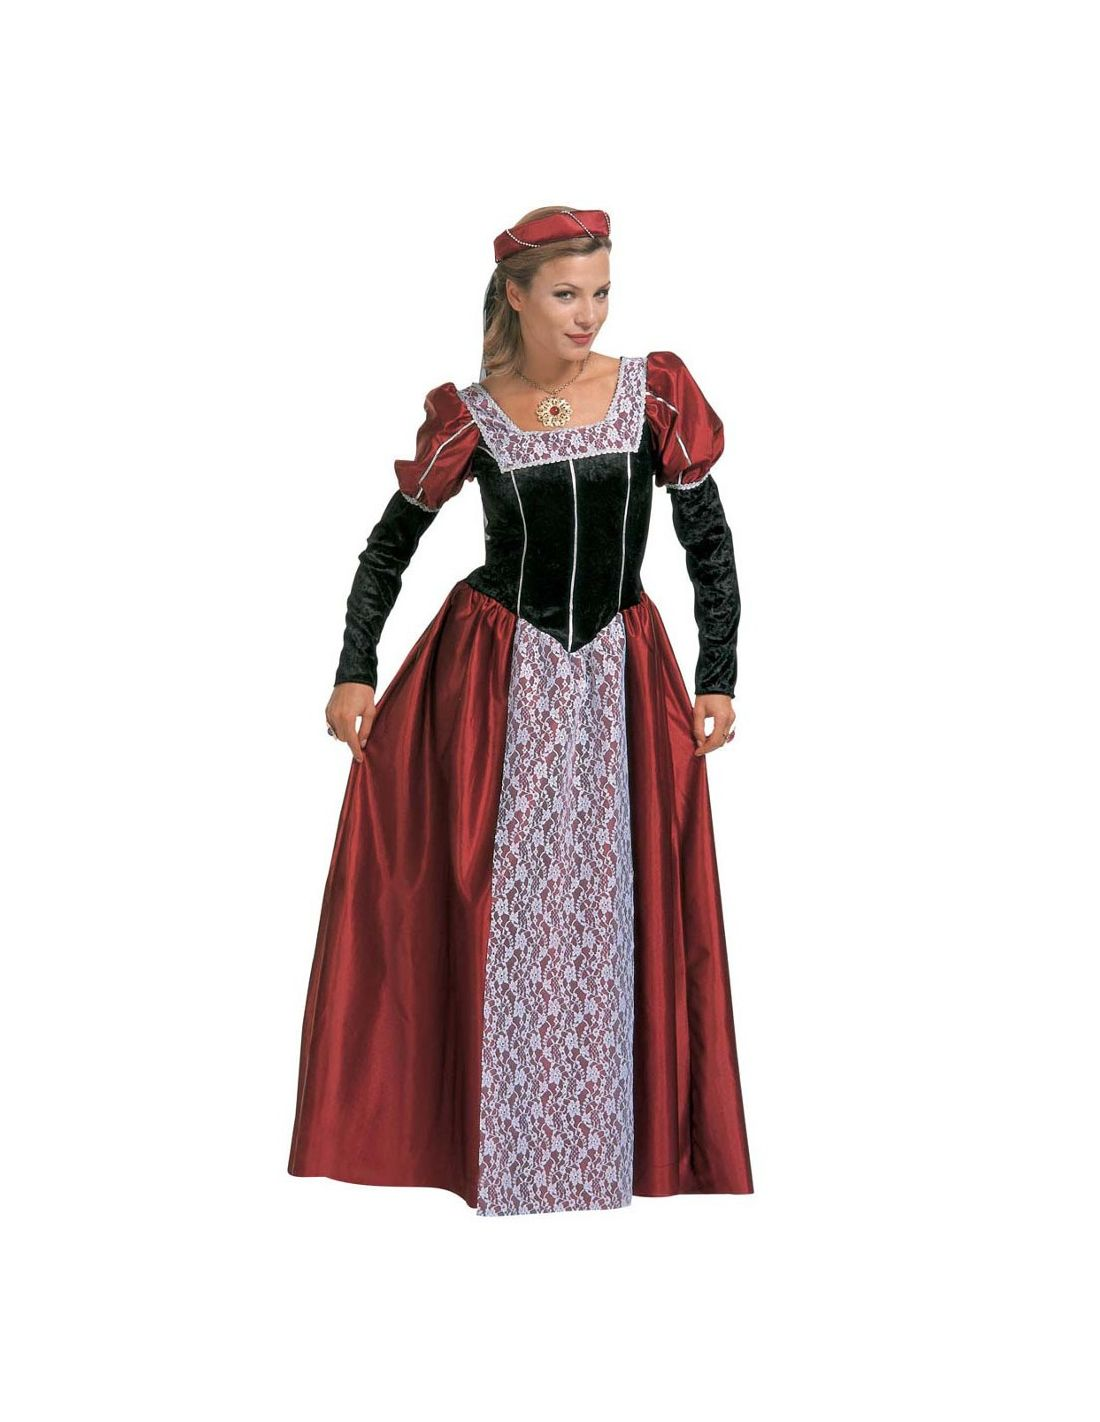 Medieval Realeza Para Realeza Disfraz Medieval Disfraz Mujer Realeza Mujer Para Para Medieval Disfraz Mujer Realeza Disfraz AwUxqIw